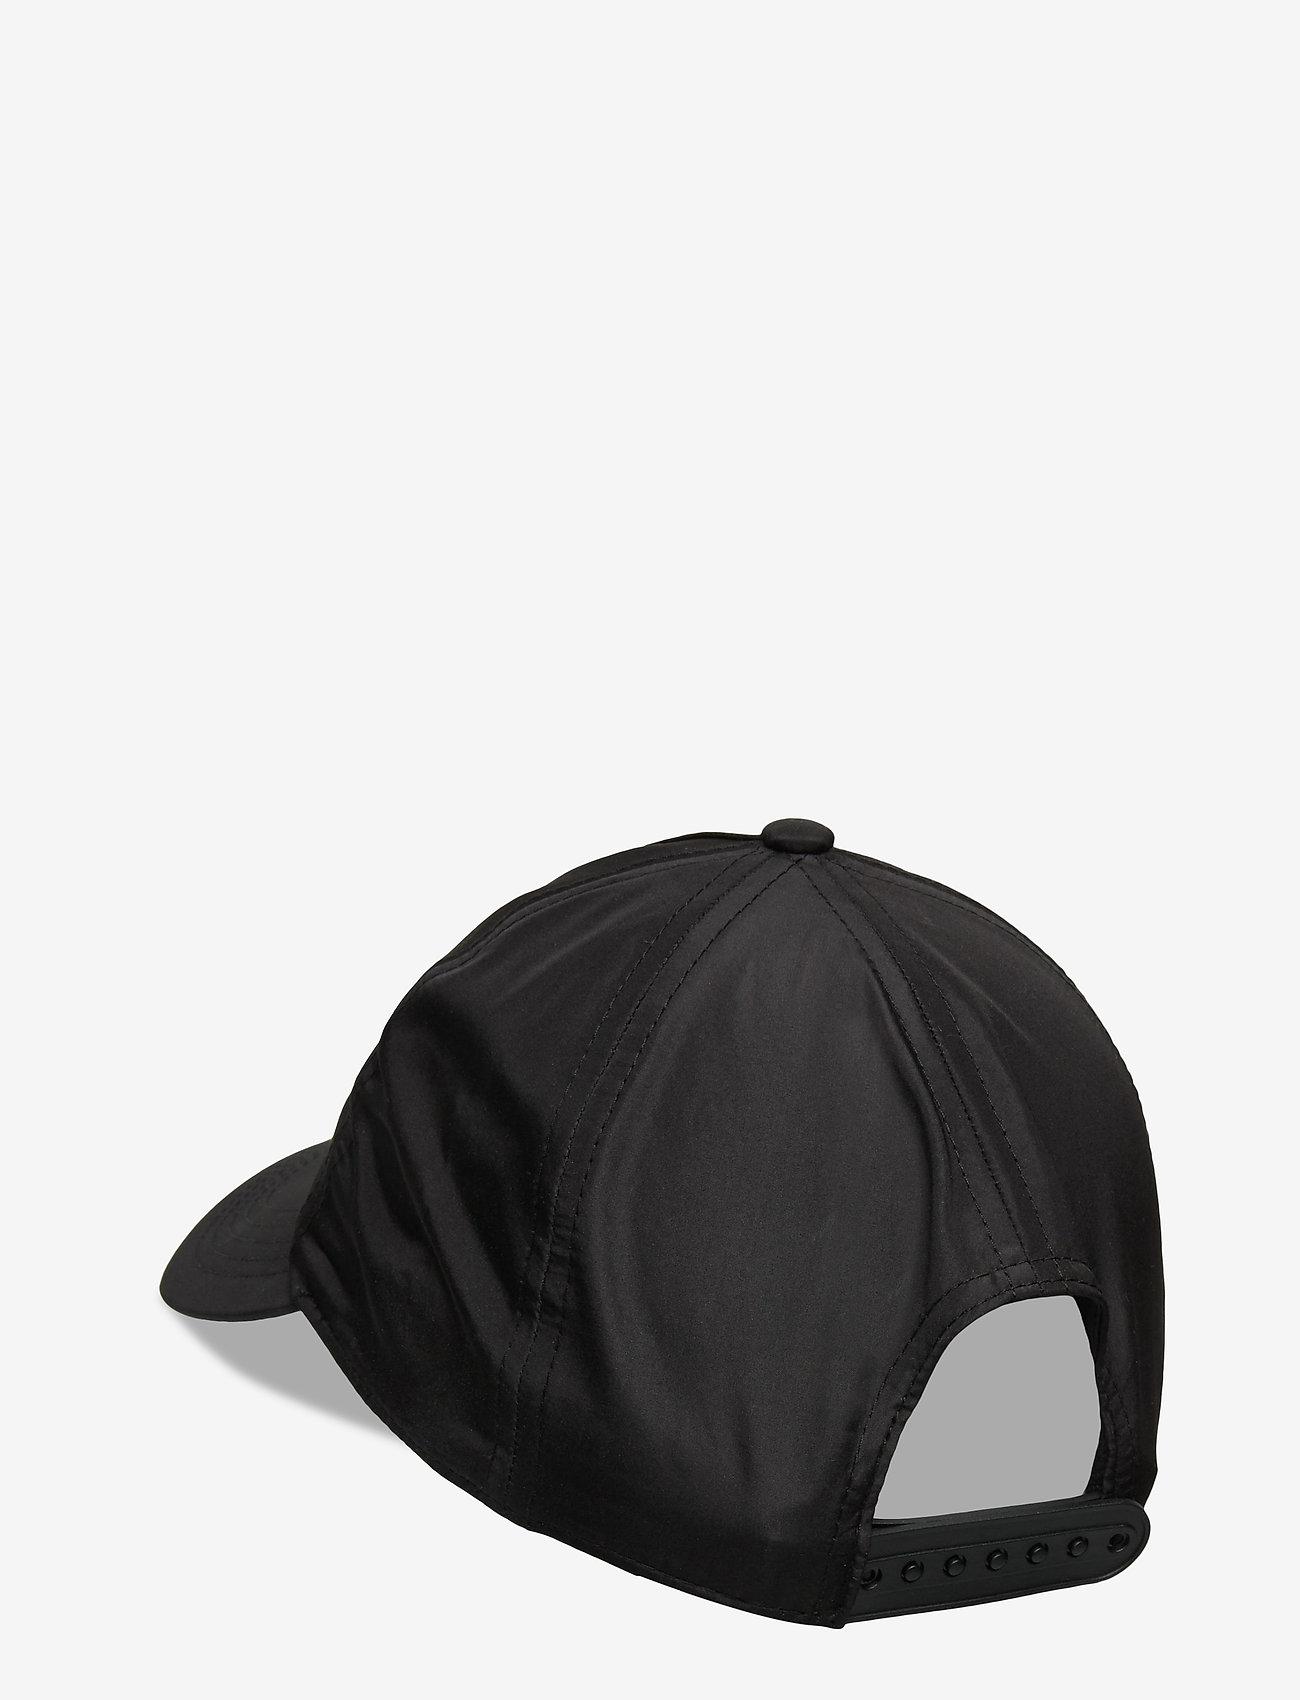 Ellesse - EL OLBO CAP - kasketter - black - 1